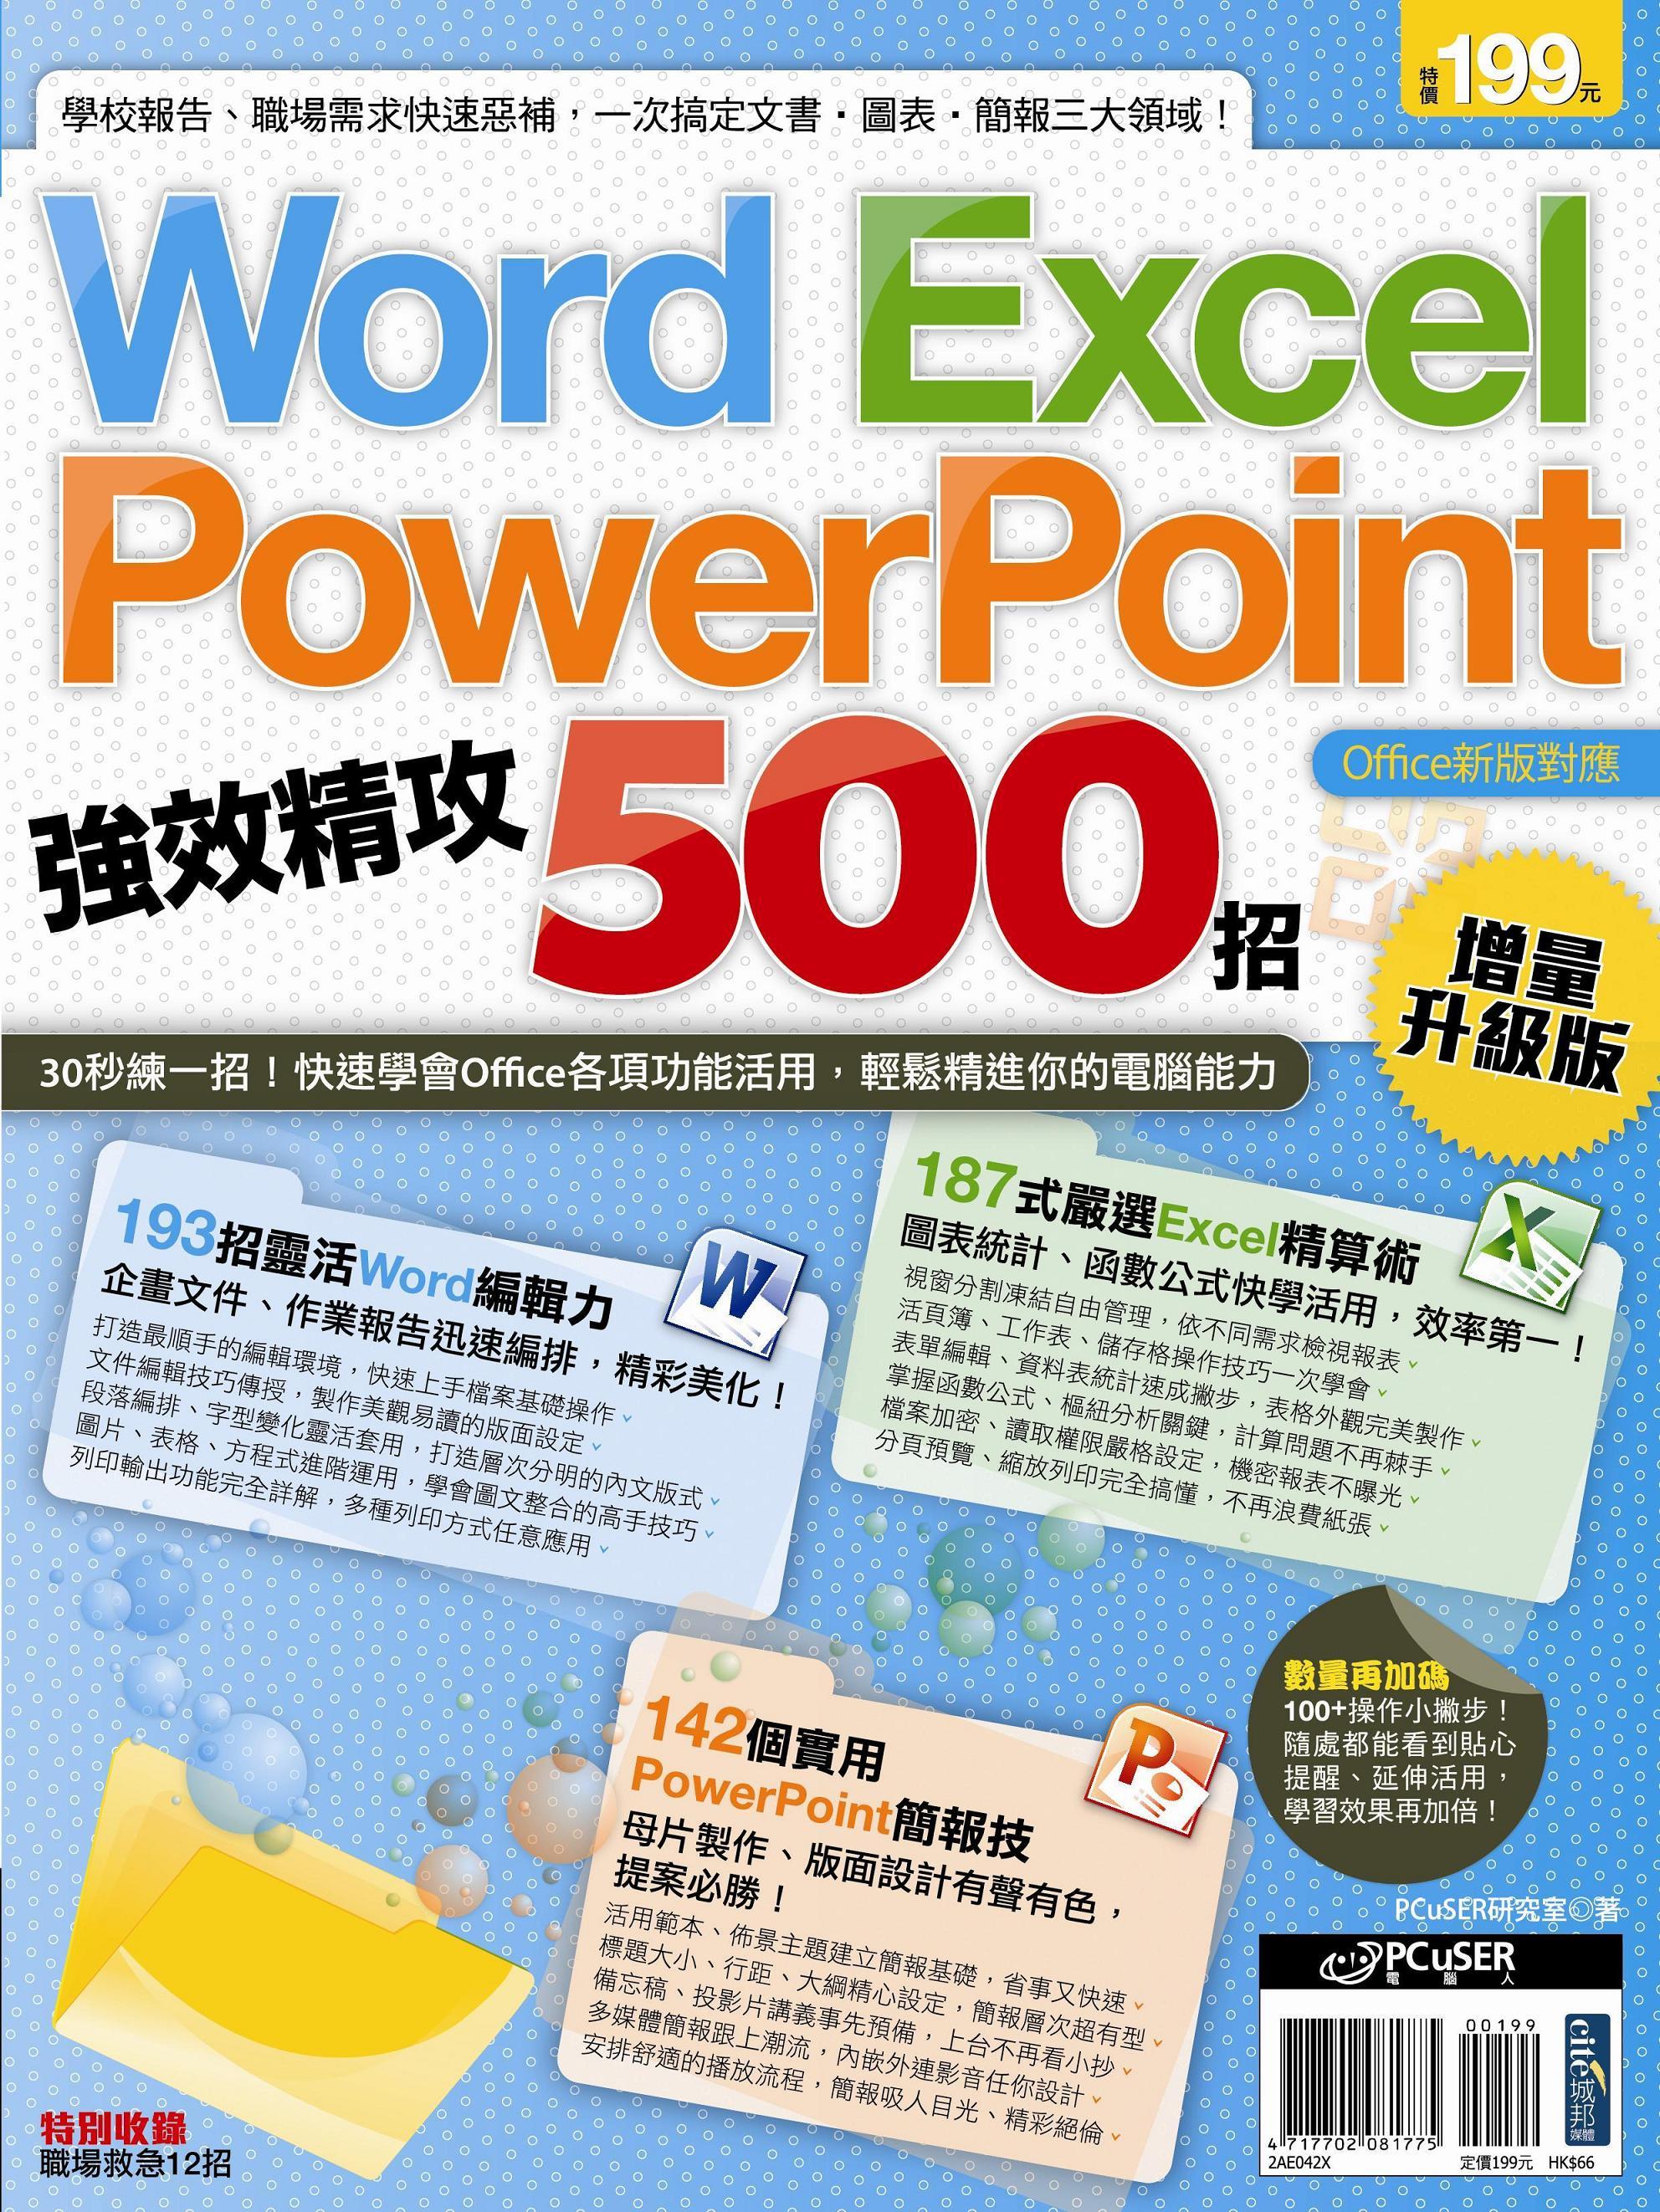 c++ primer 4 e 繁體 中文 版 pdf